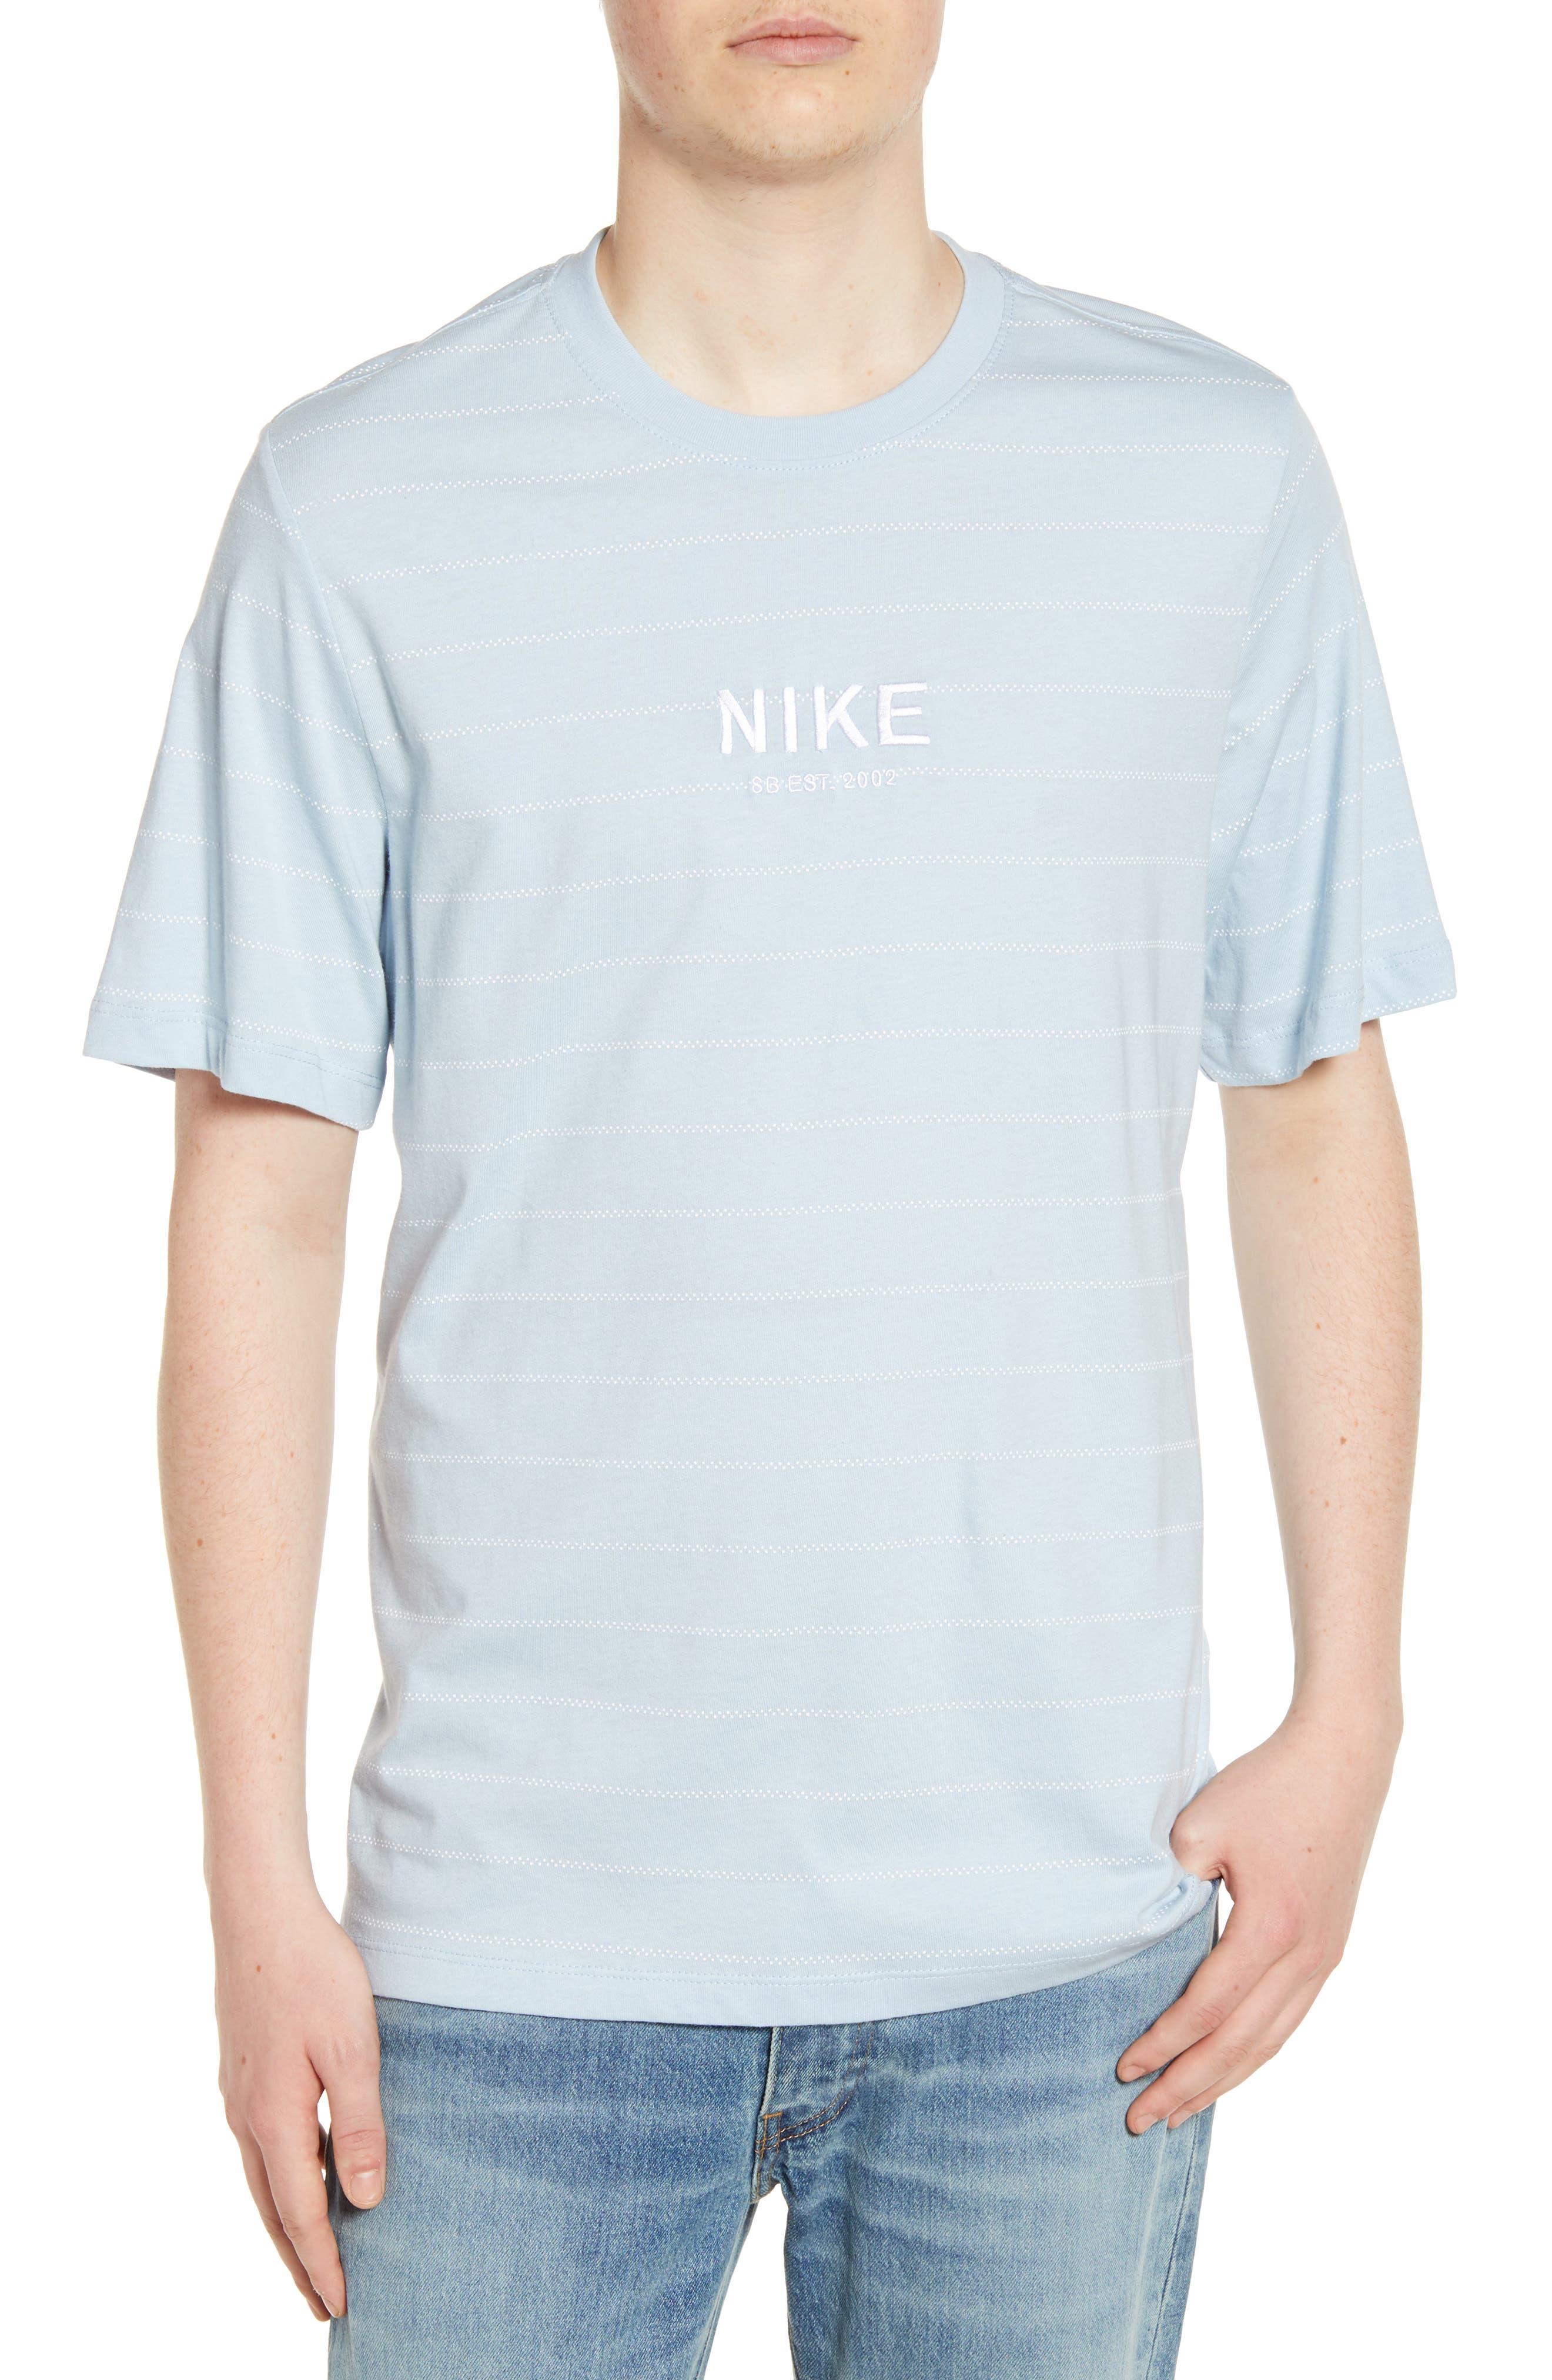 ba673bbc Men's NIKE SB T-Shirts, Tank Tops, & Graphic Tees   Nordstrom